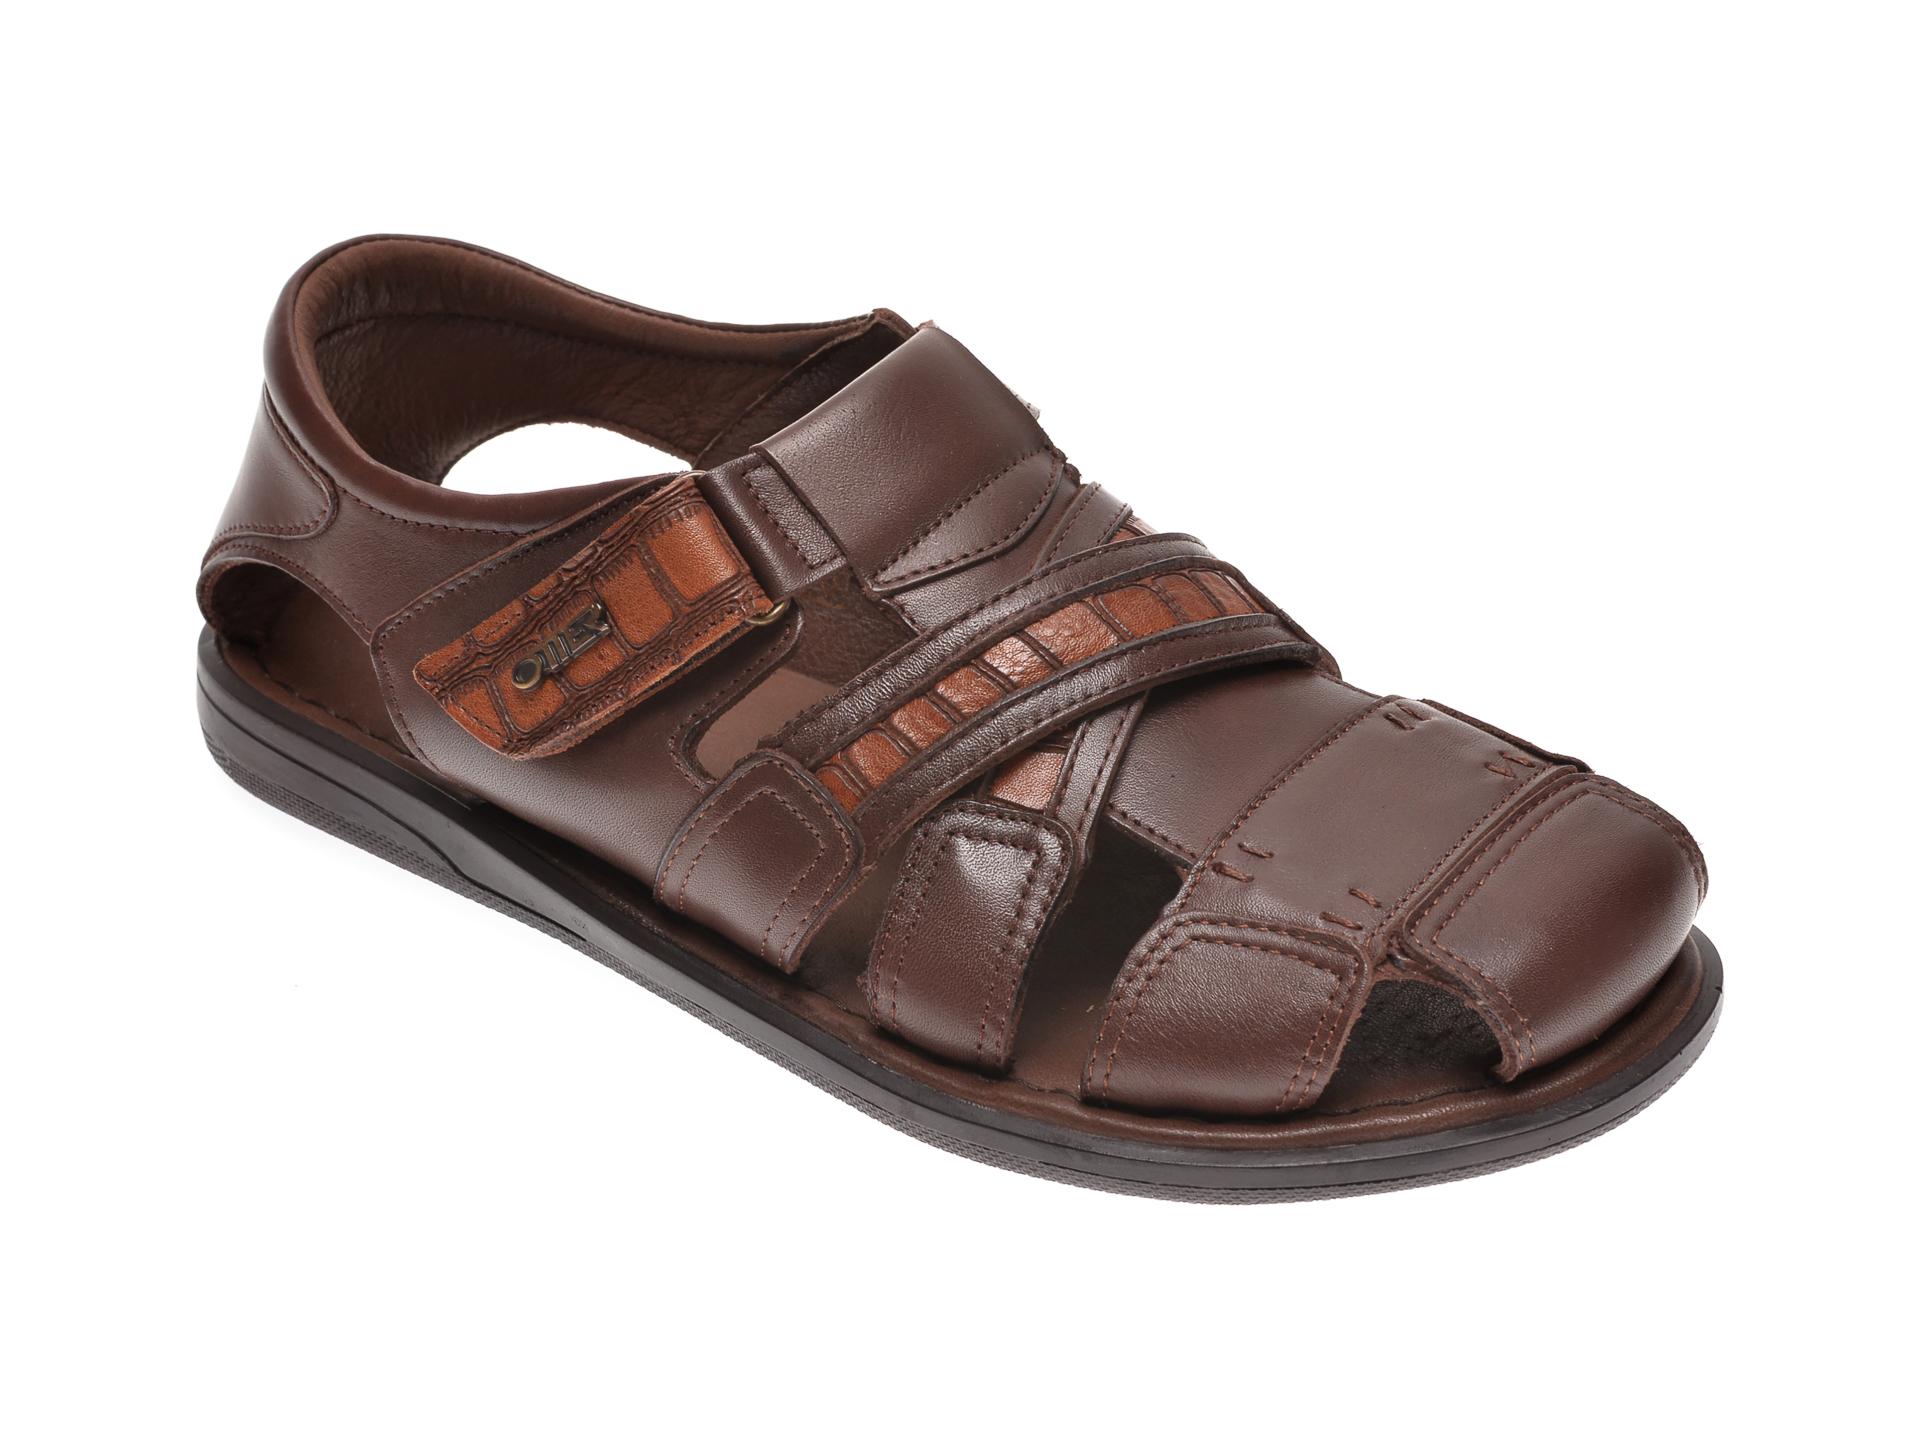 Sandale OTTER maro, 17400, din piele naturala imagine